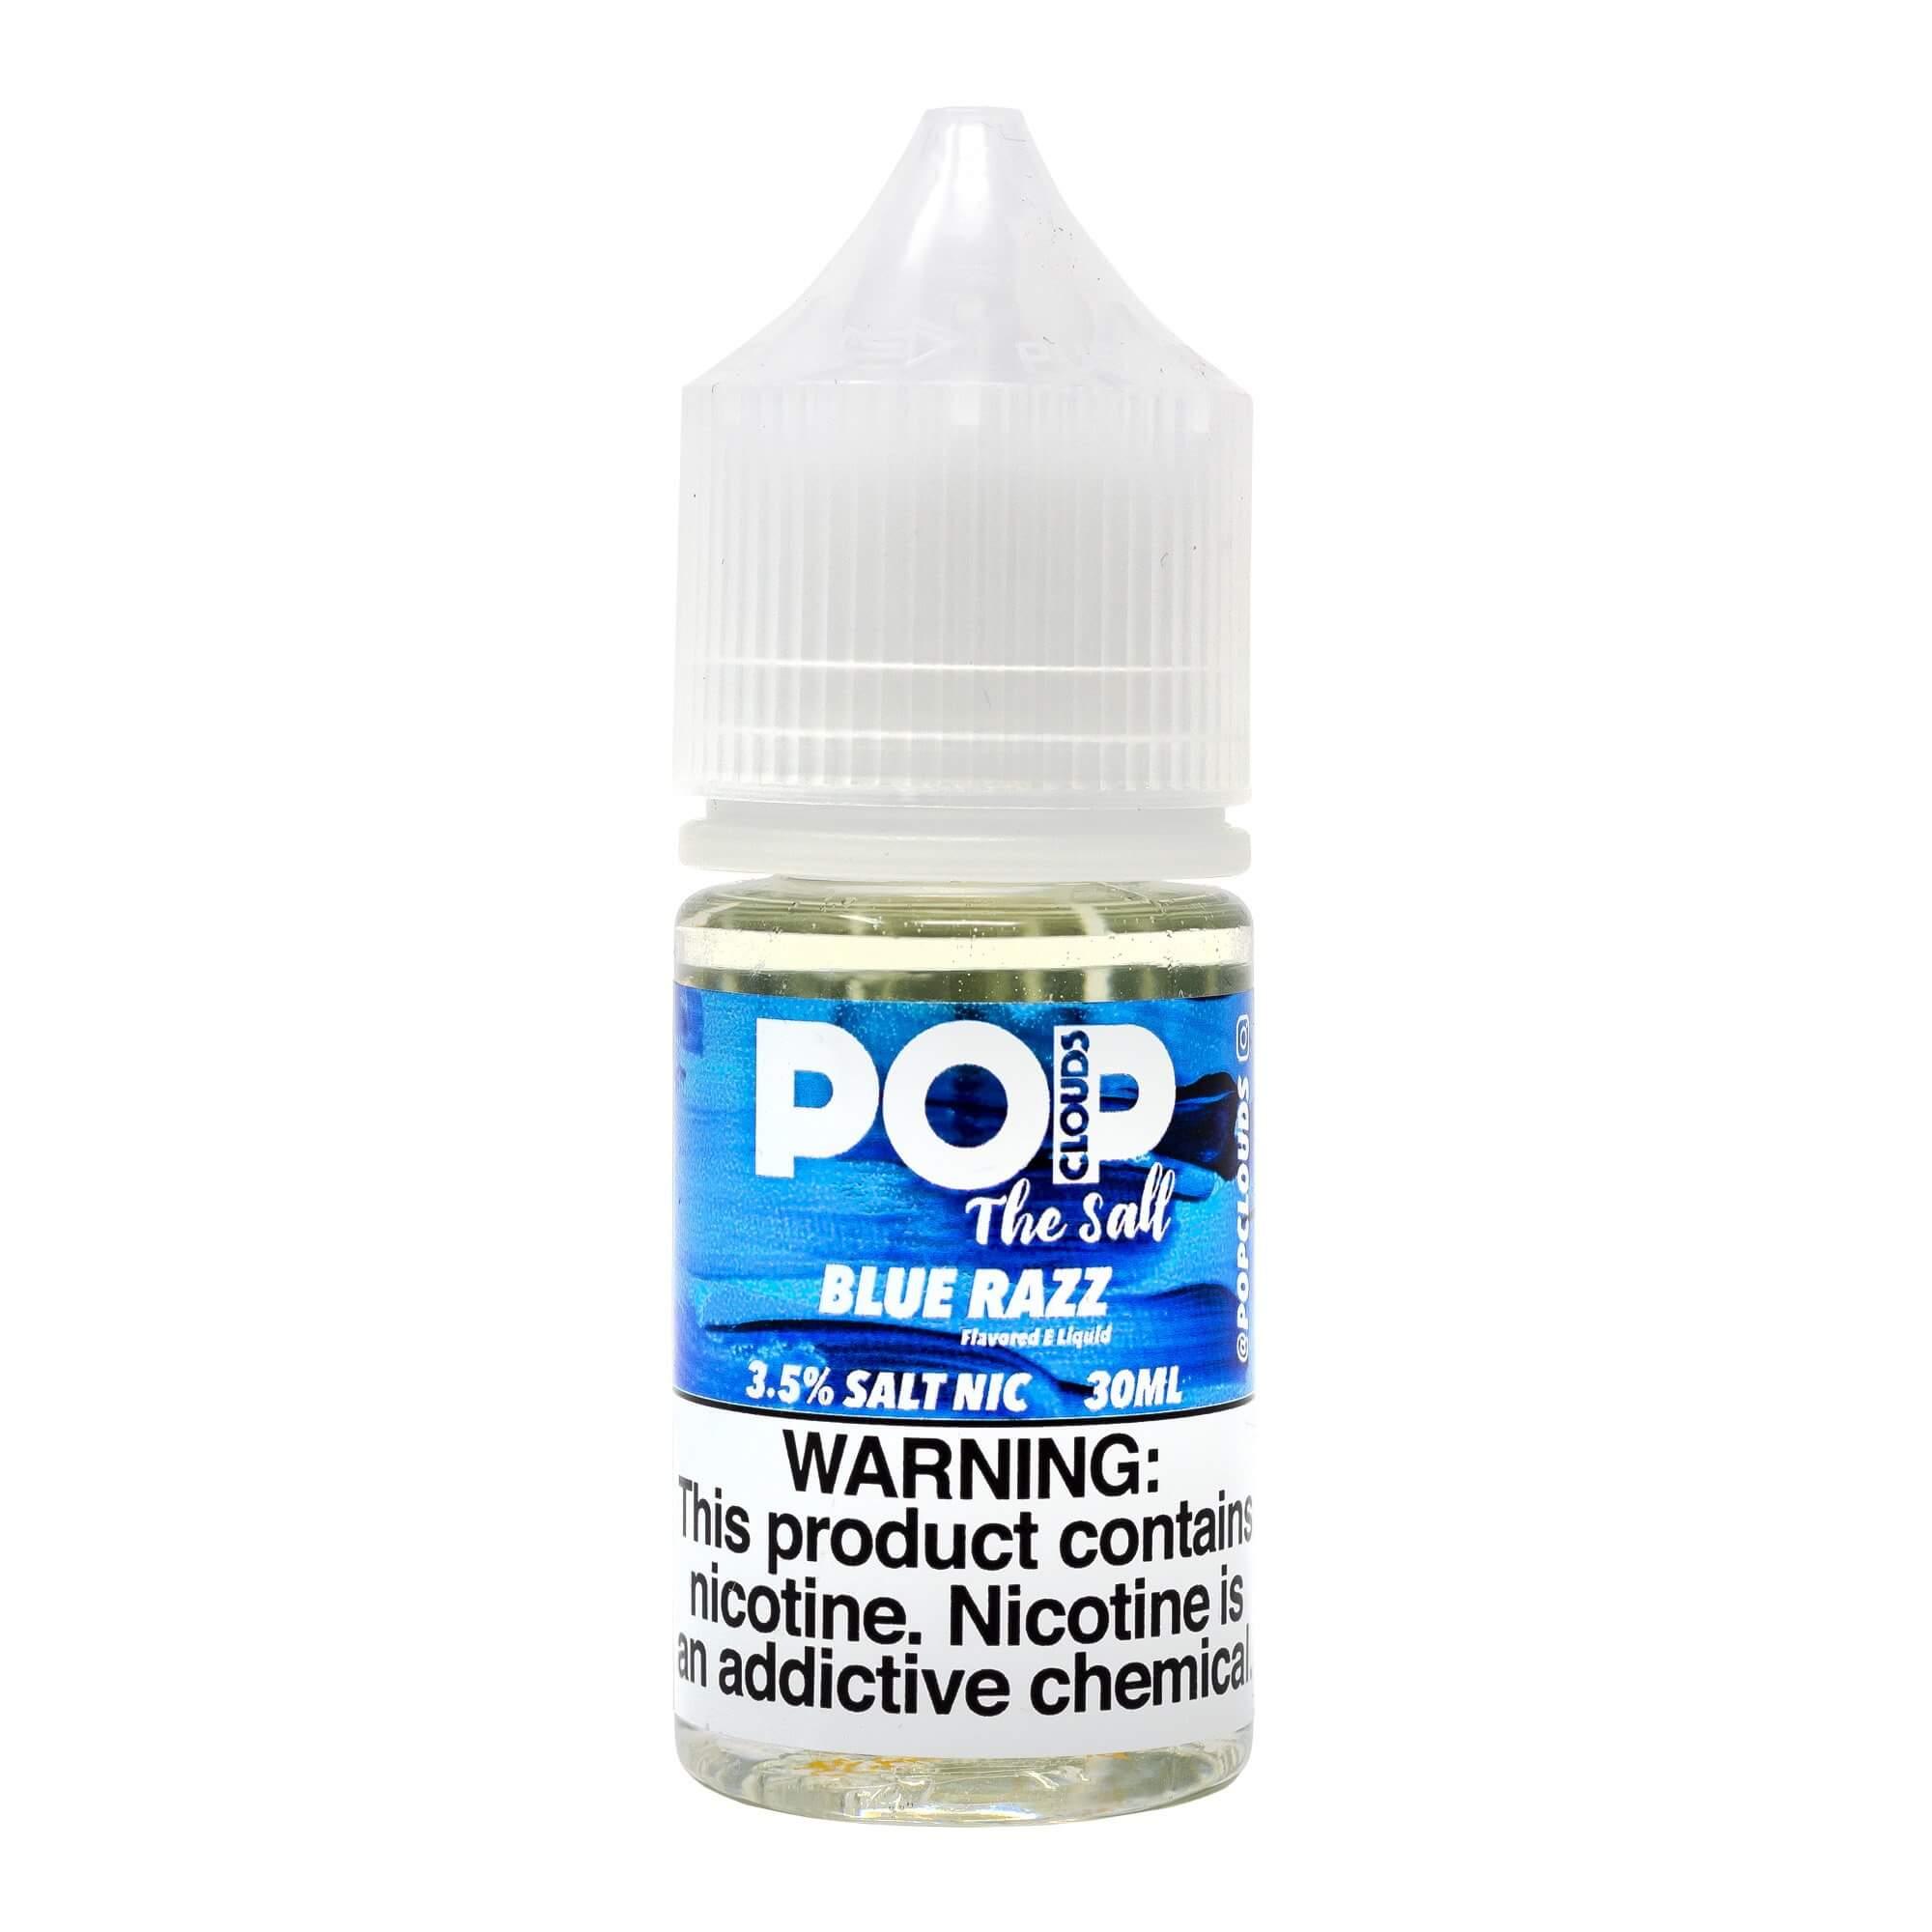 Pop Blue Razz